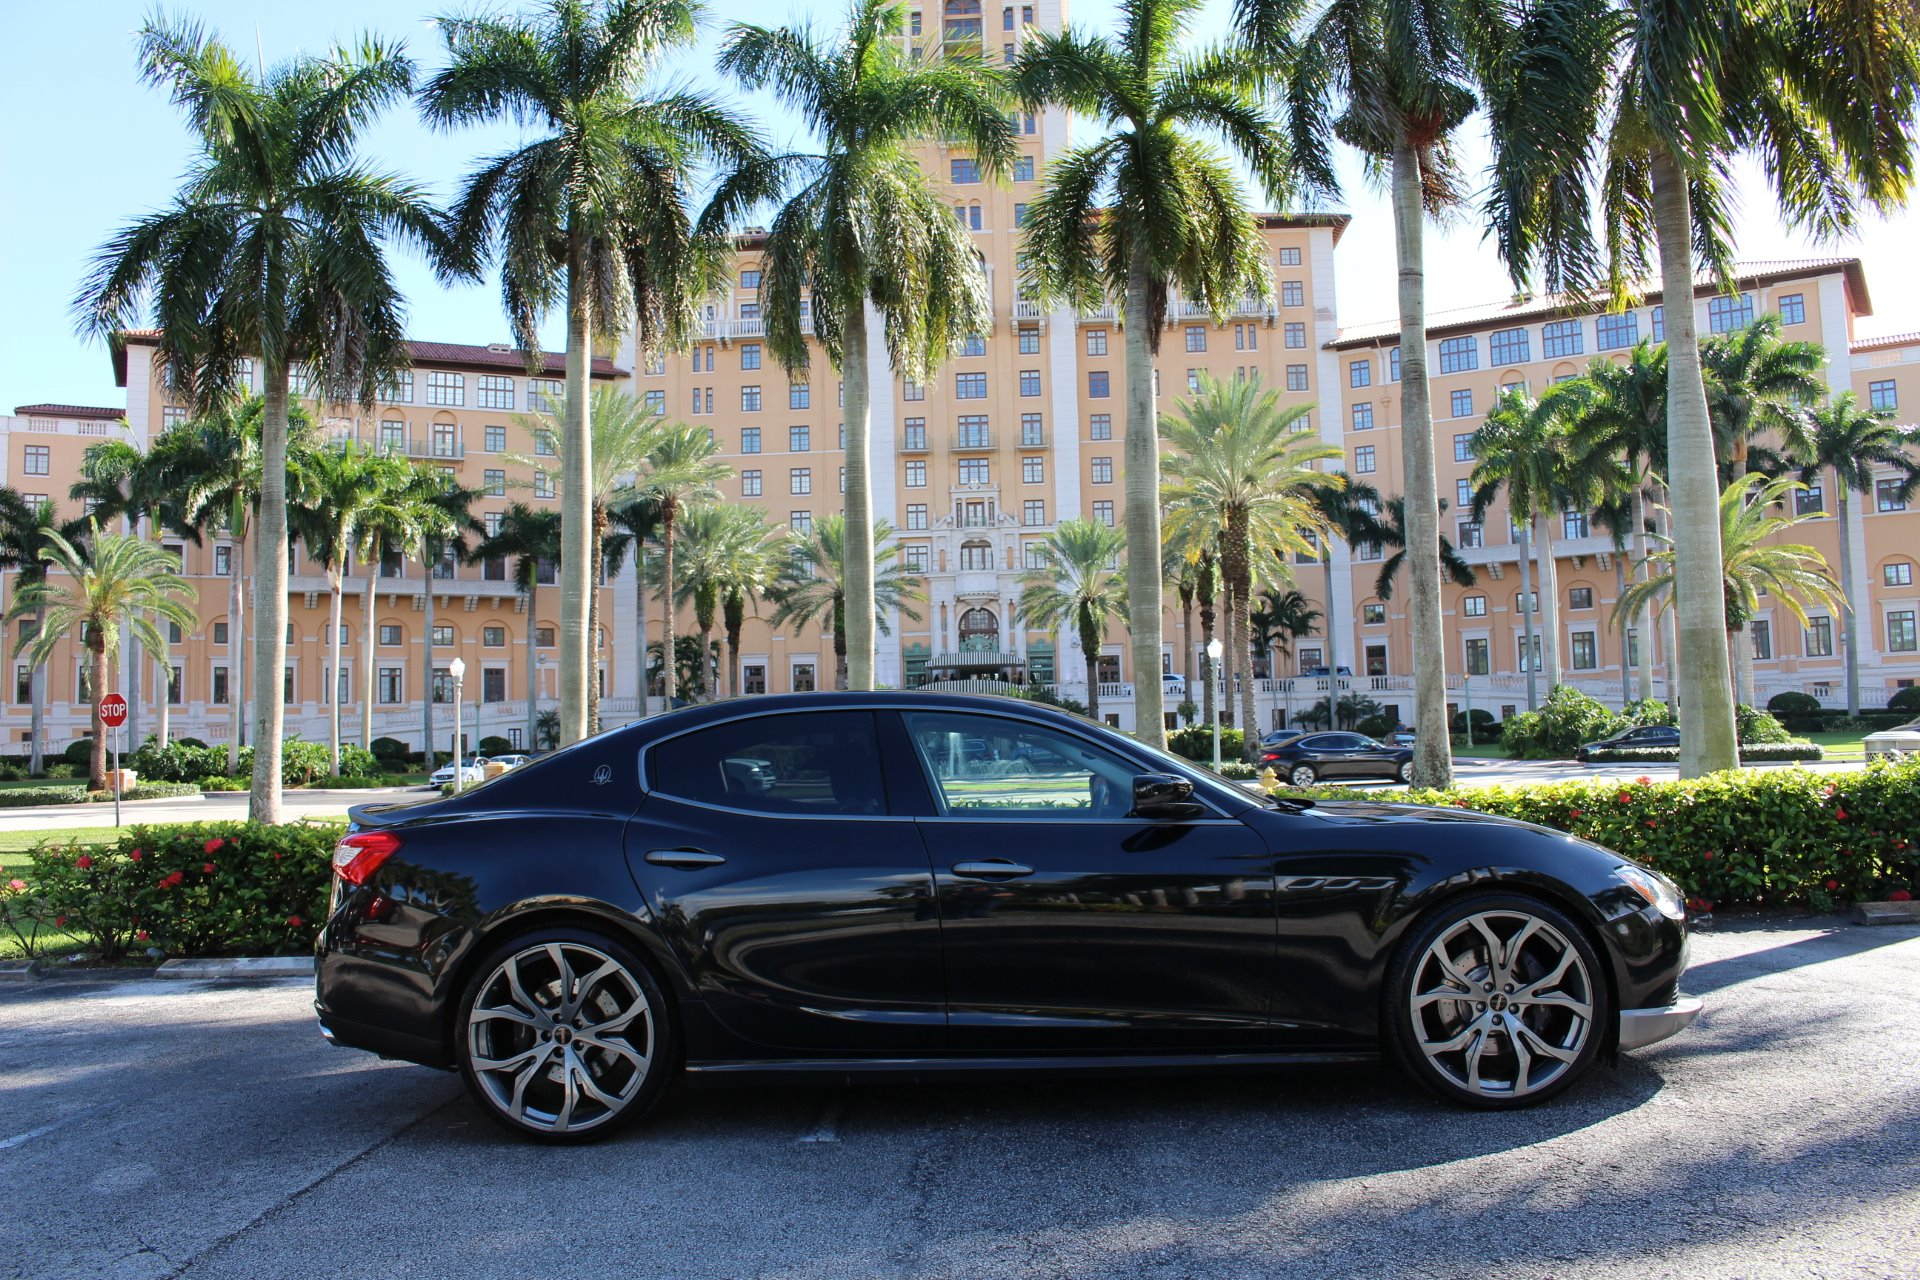 Used 2015 Maserati Ghibli SQ4 Novitec for sale $32,850 at The Gables Sports Cars in Miami FL 33146 2